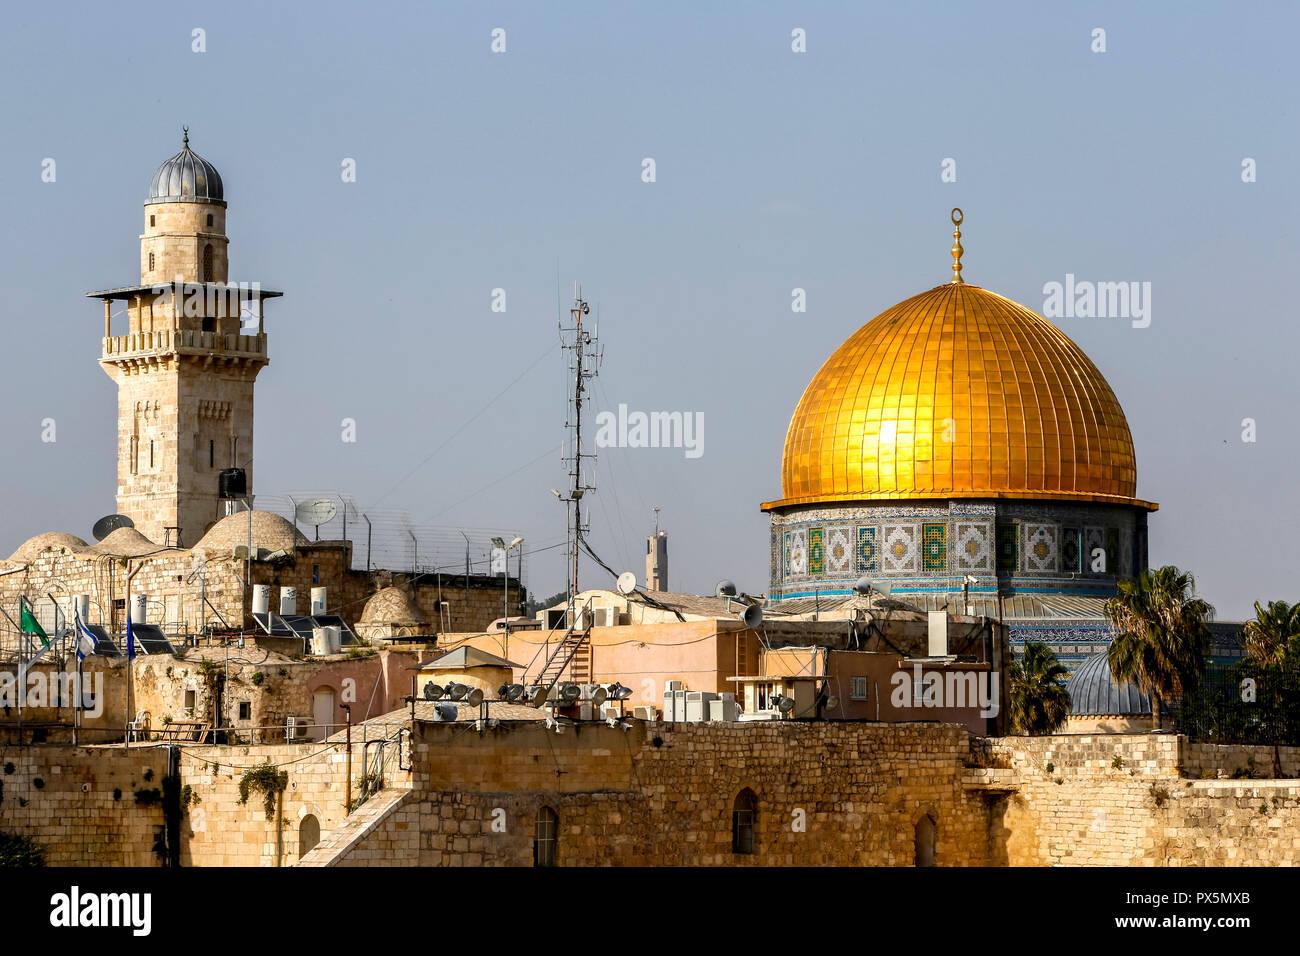 Dome of the Rock, Jerusalem. Israel. - Stock Image